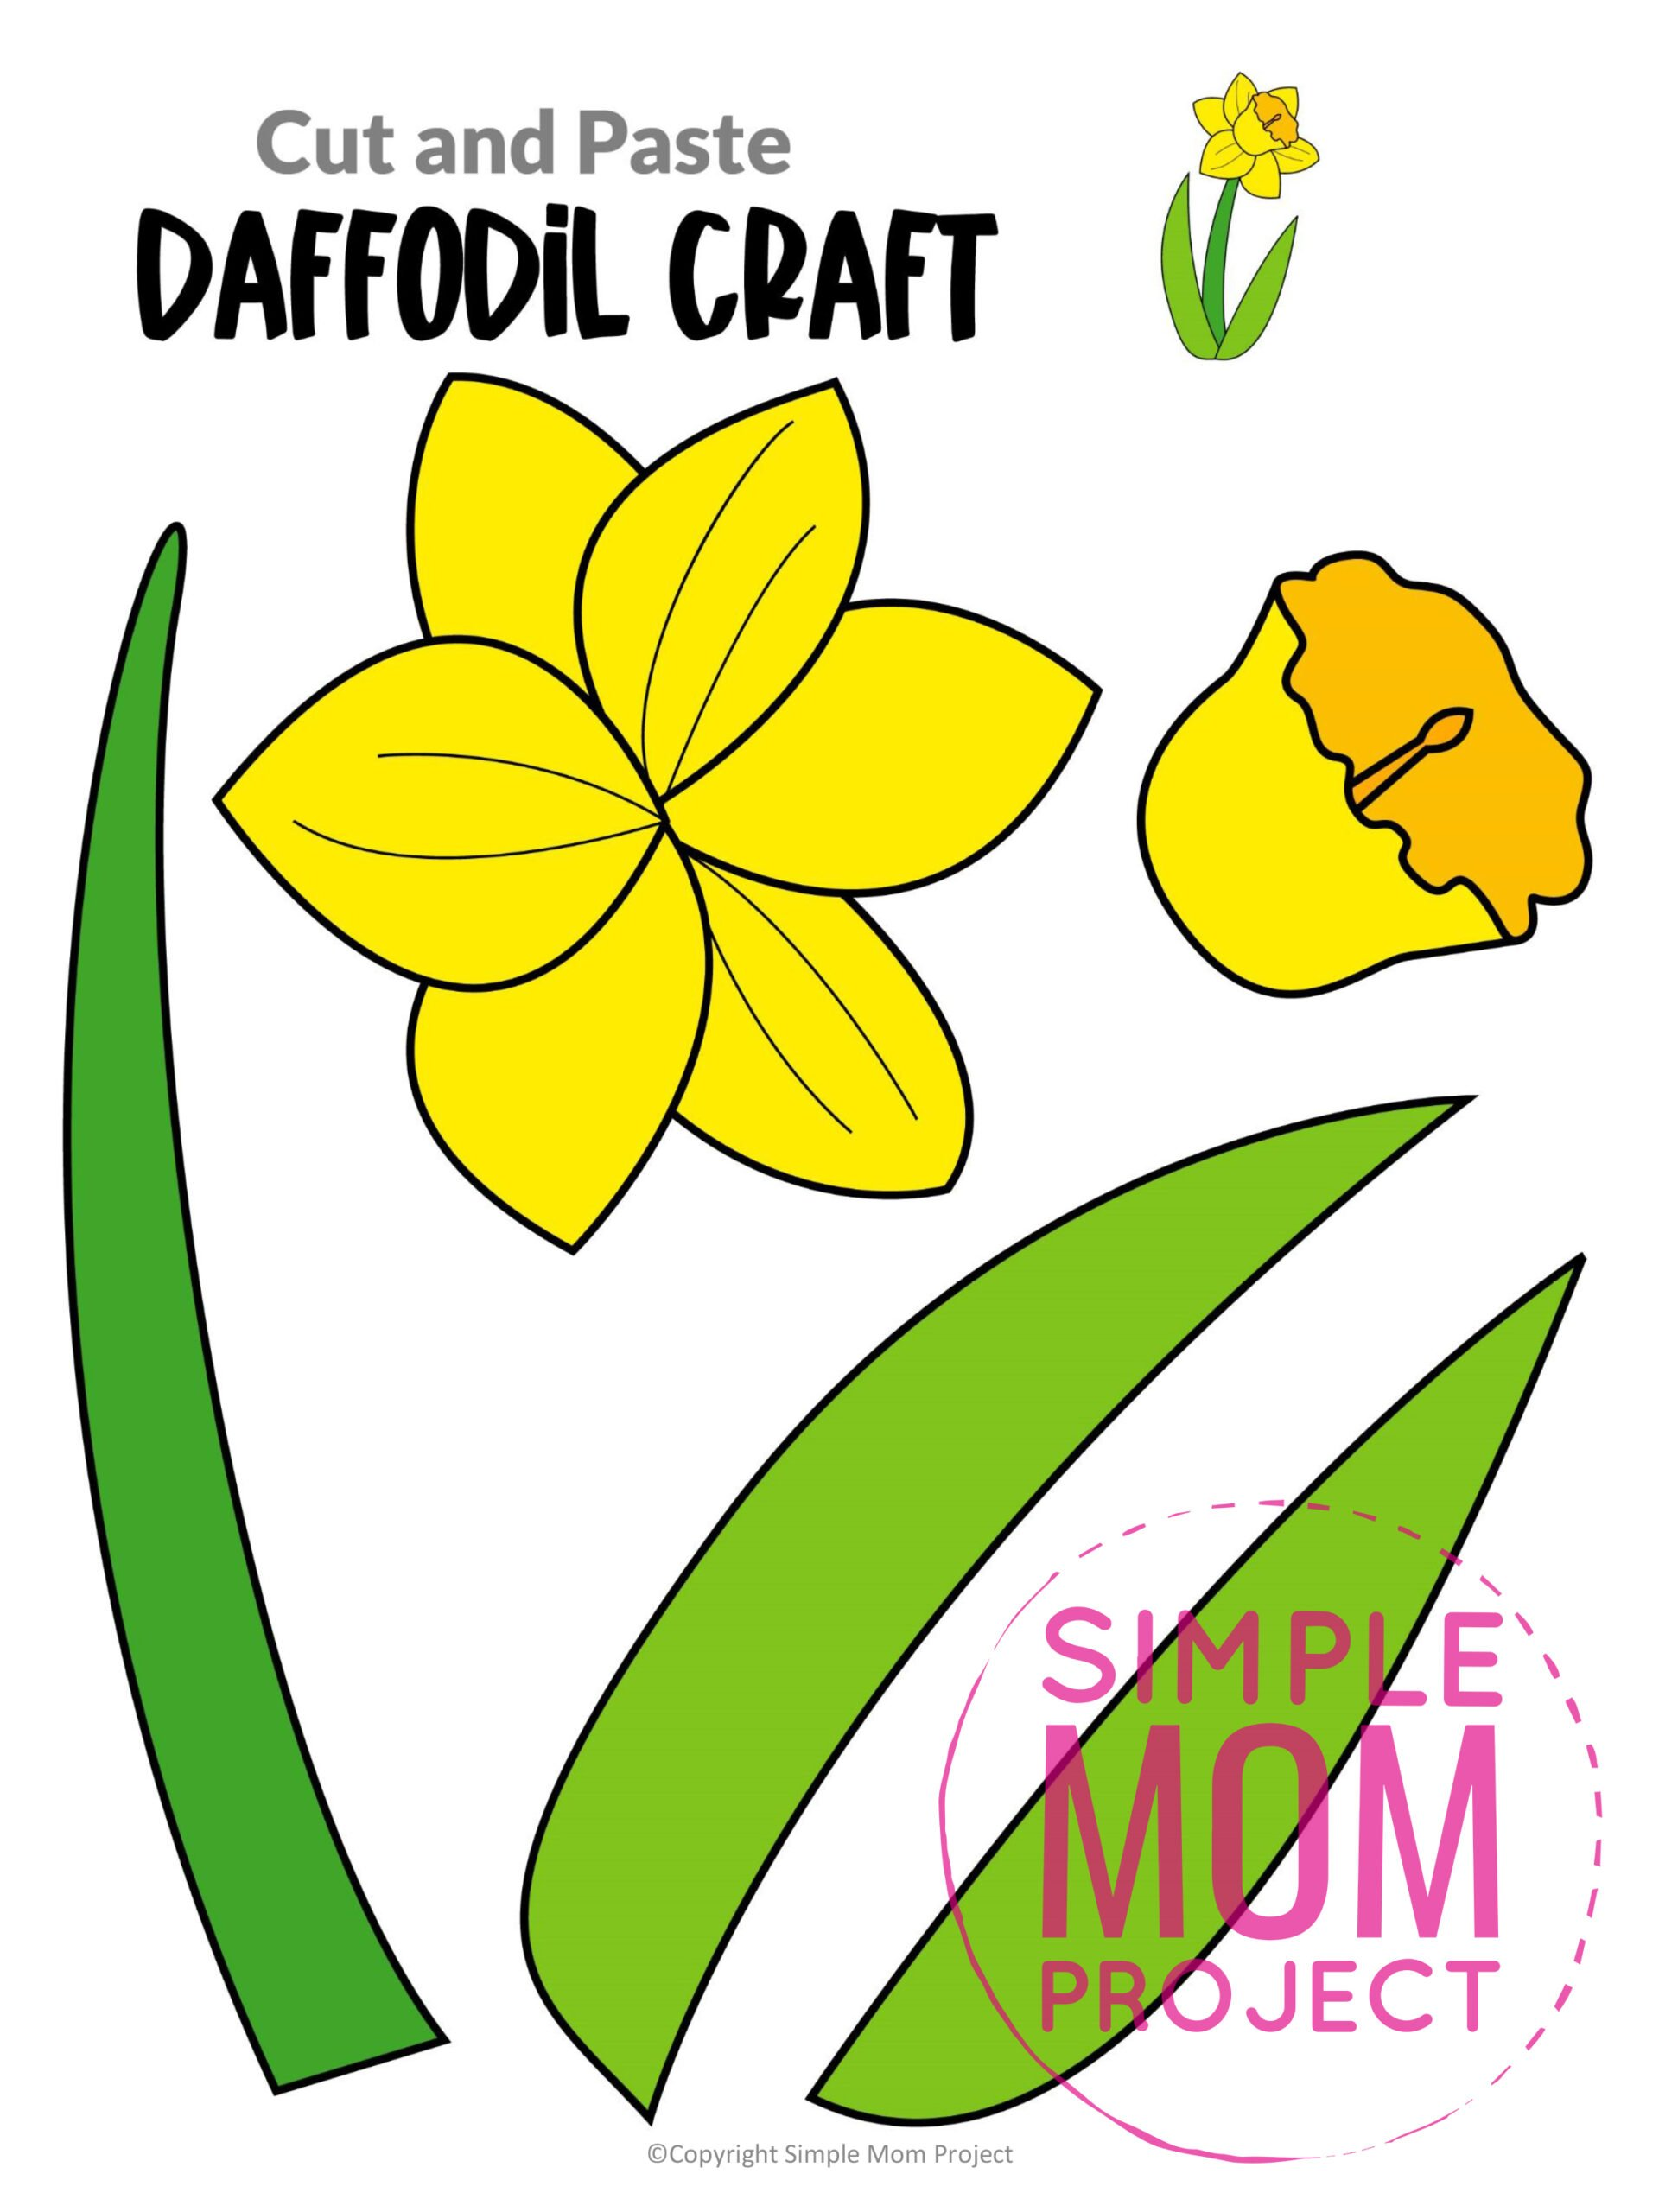 Printable Daffodil Flower Craft template for kids, Daffodil craft for toddlers and Daffodil craft for kindergartners